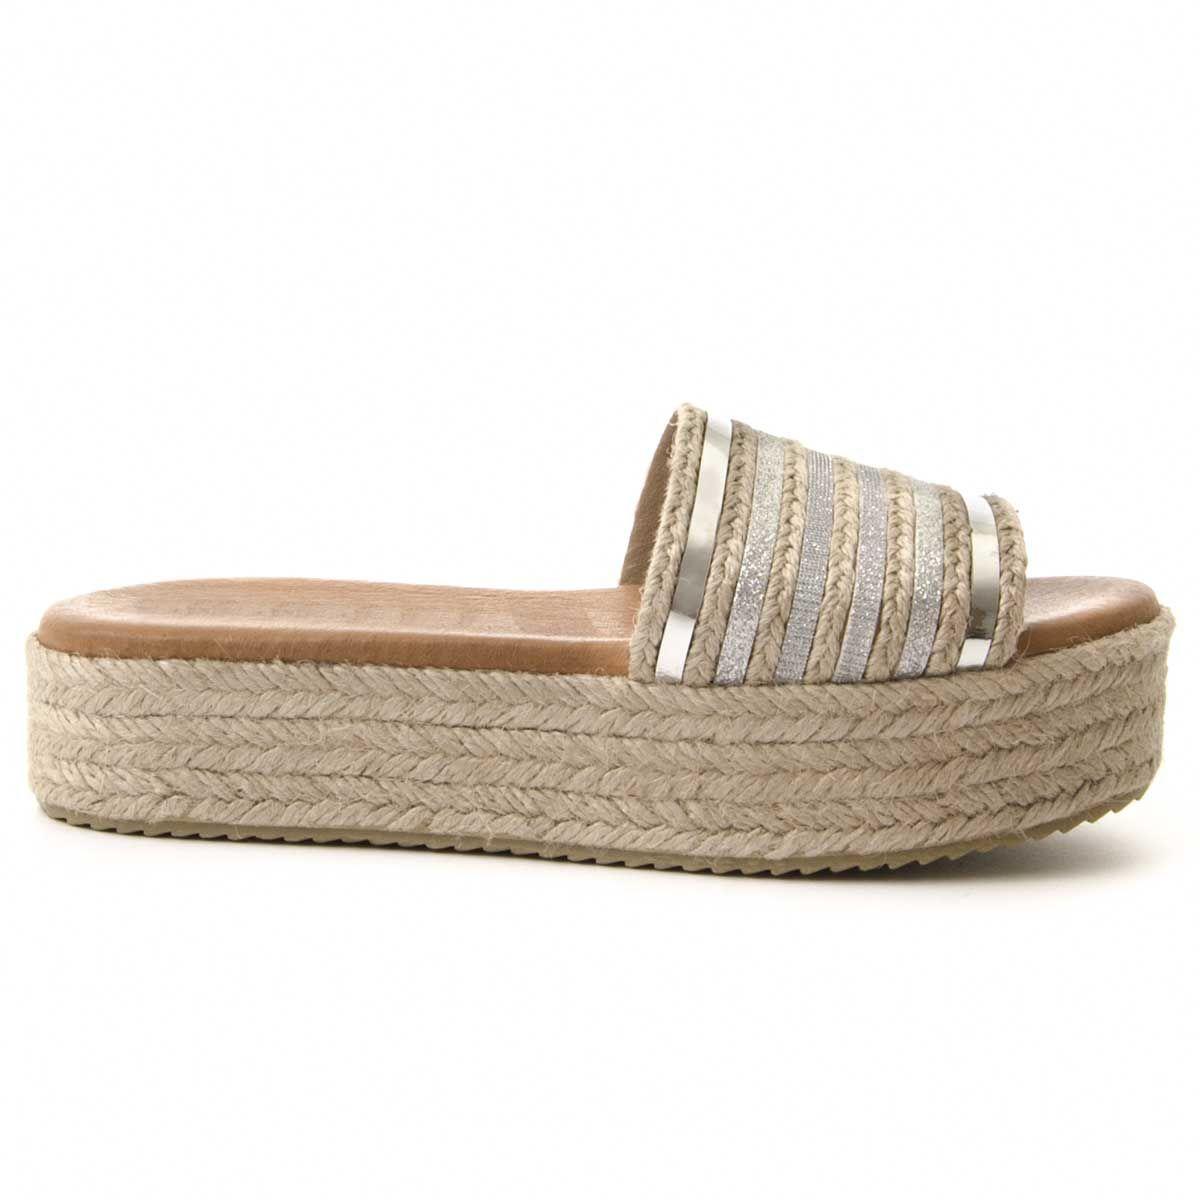 Purapiel Flatform Espadrille Sandal in Silver